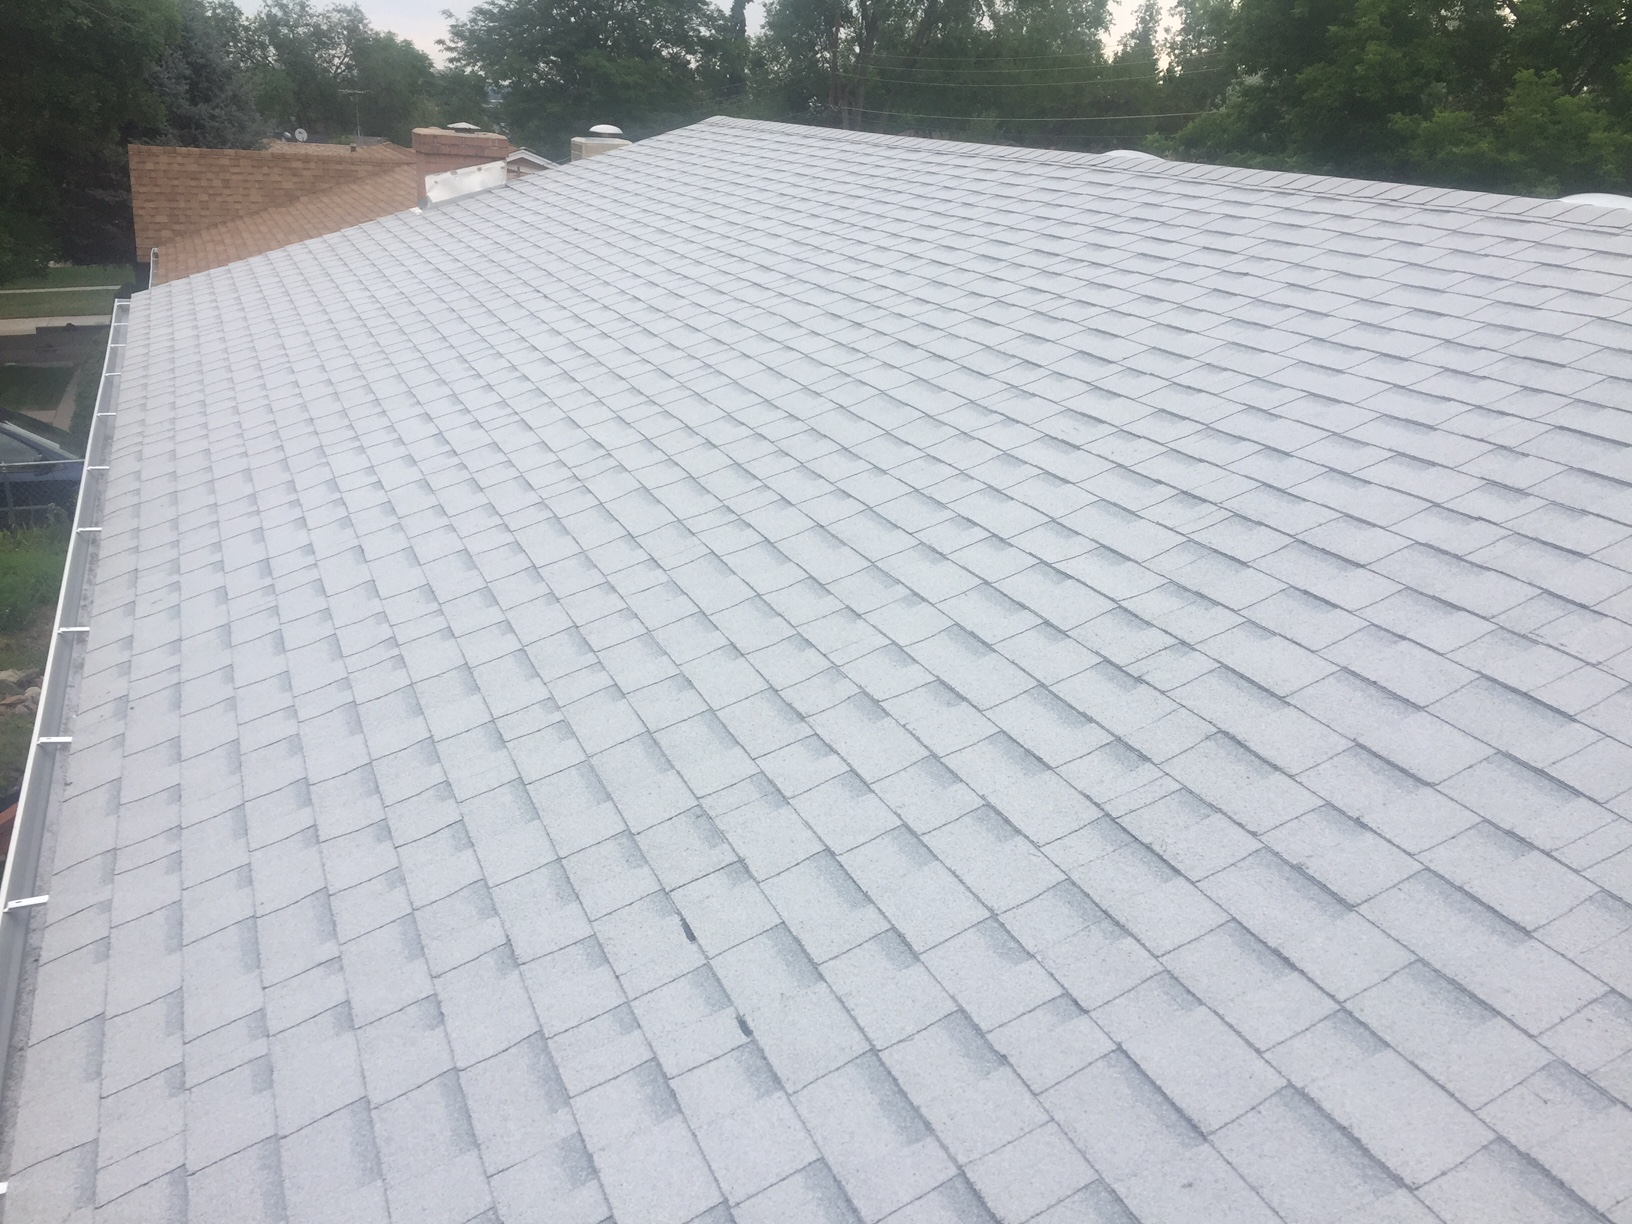 New House Roof With Oakridge Shasta White Shingles In